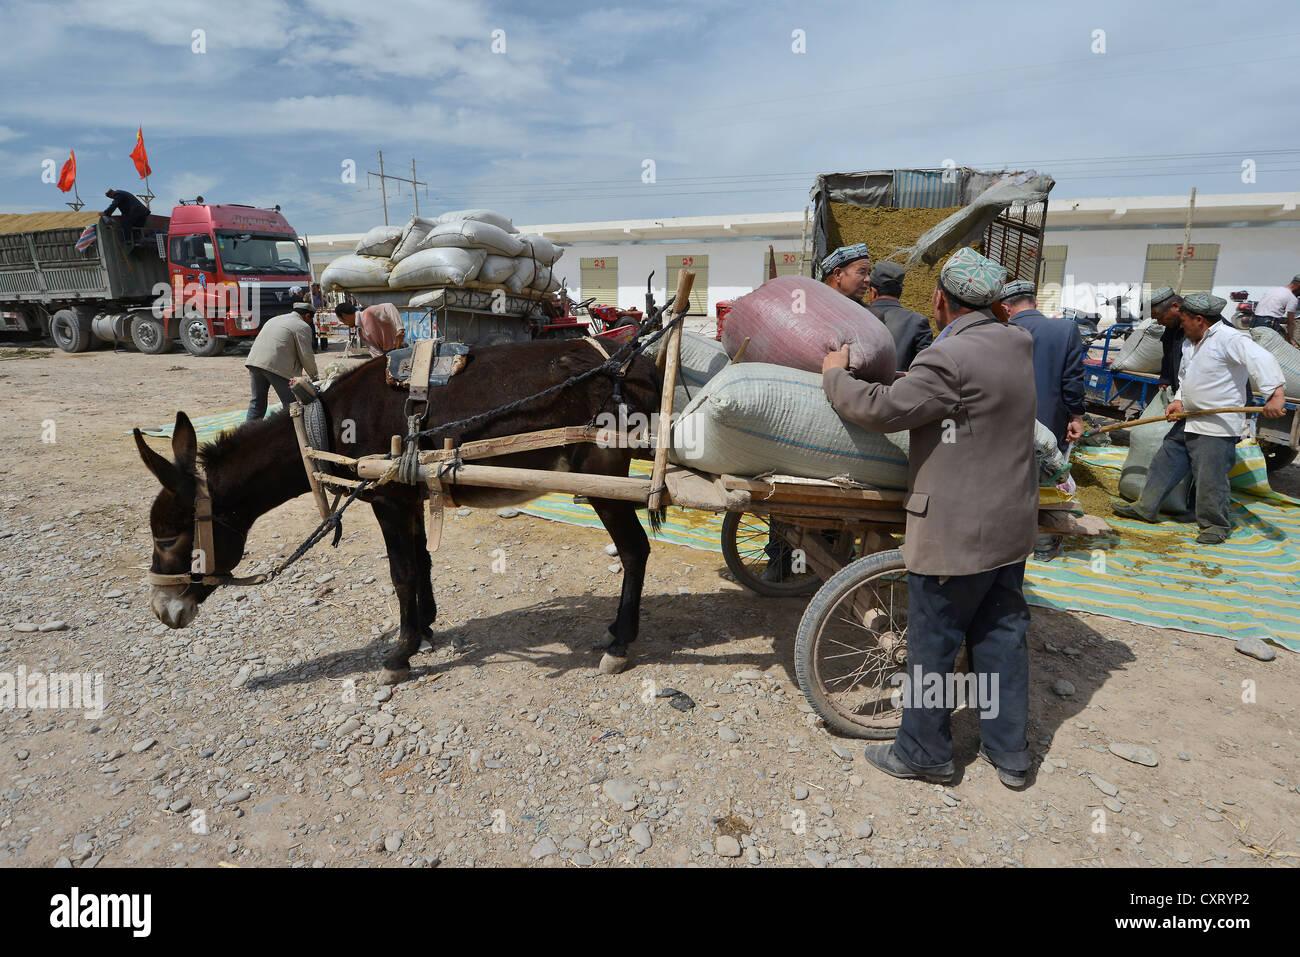 Muslim man, Uyghur with a cap loading his donkey cart with sacks of manure, fertiliser, Uyghur cattle market, Sunday - Stock Image